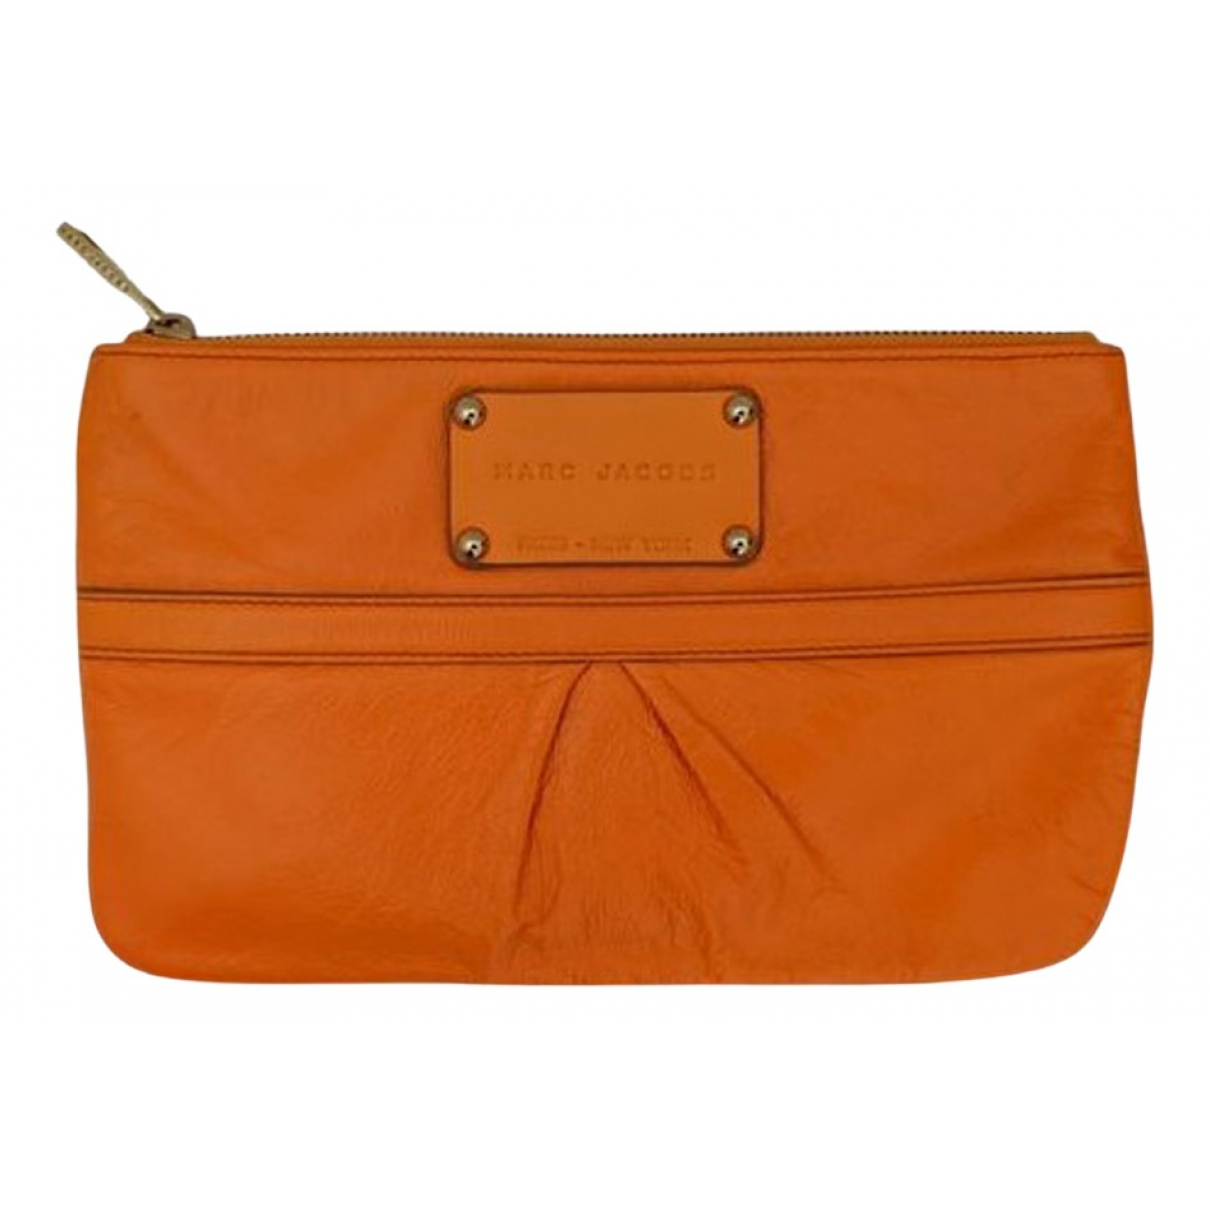 Marc Jacobs N Orange Leather Clutch bag for Women N